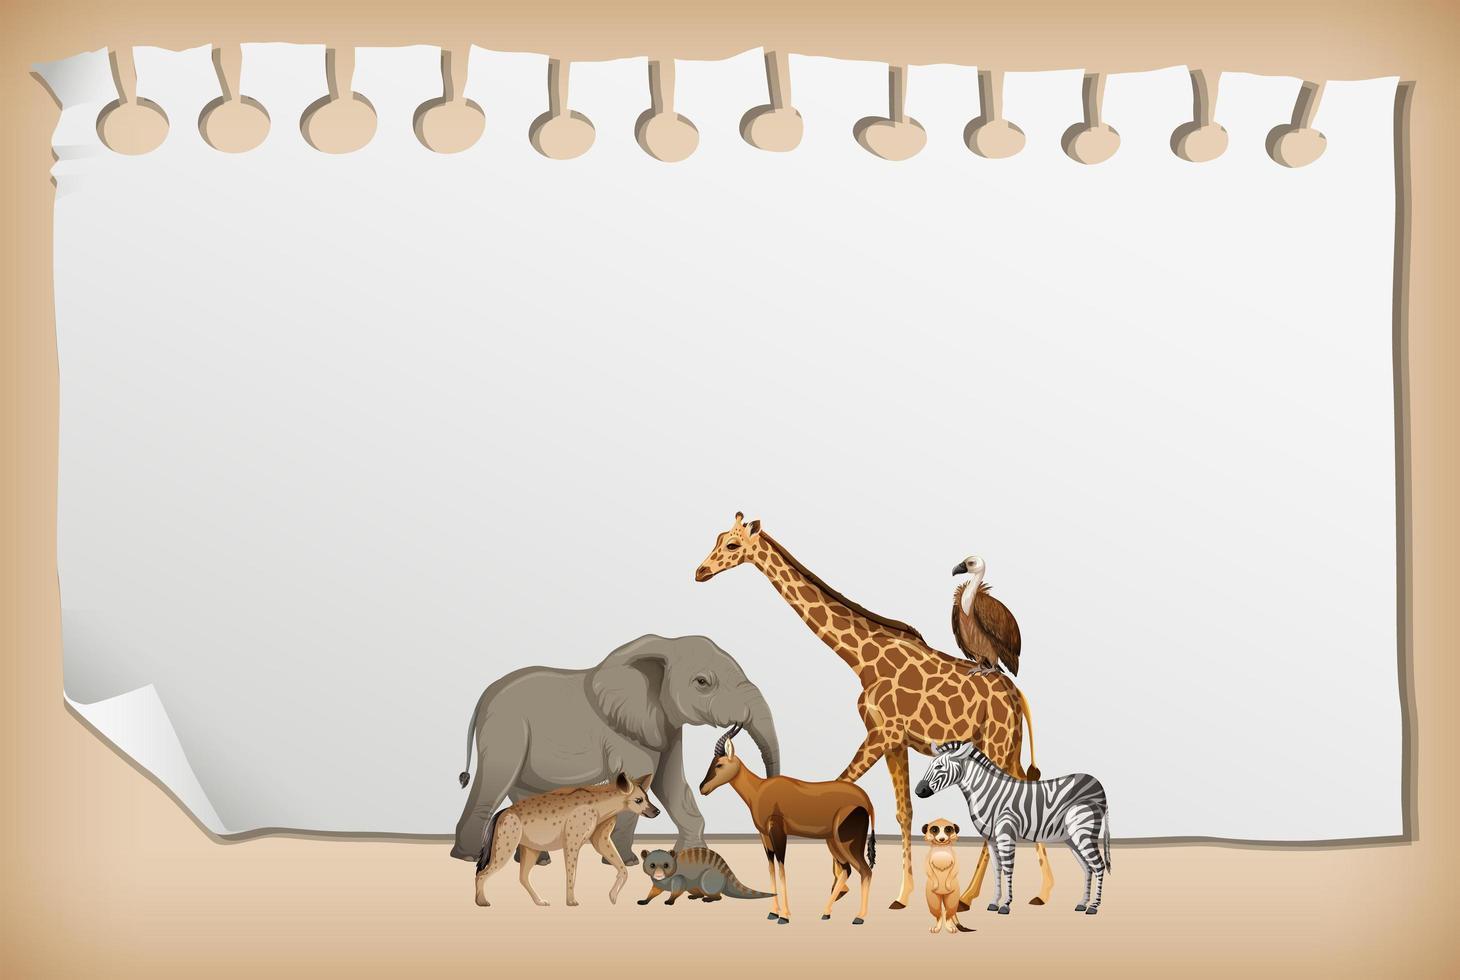 tomt papper banner med vilda afrikanska djur vektor